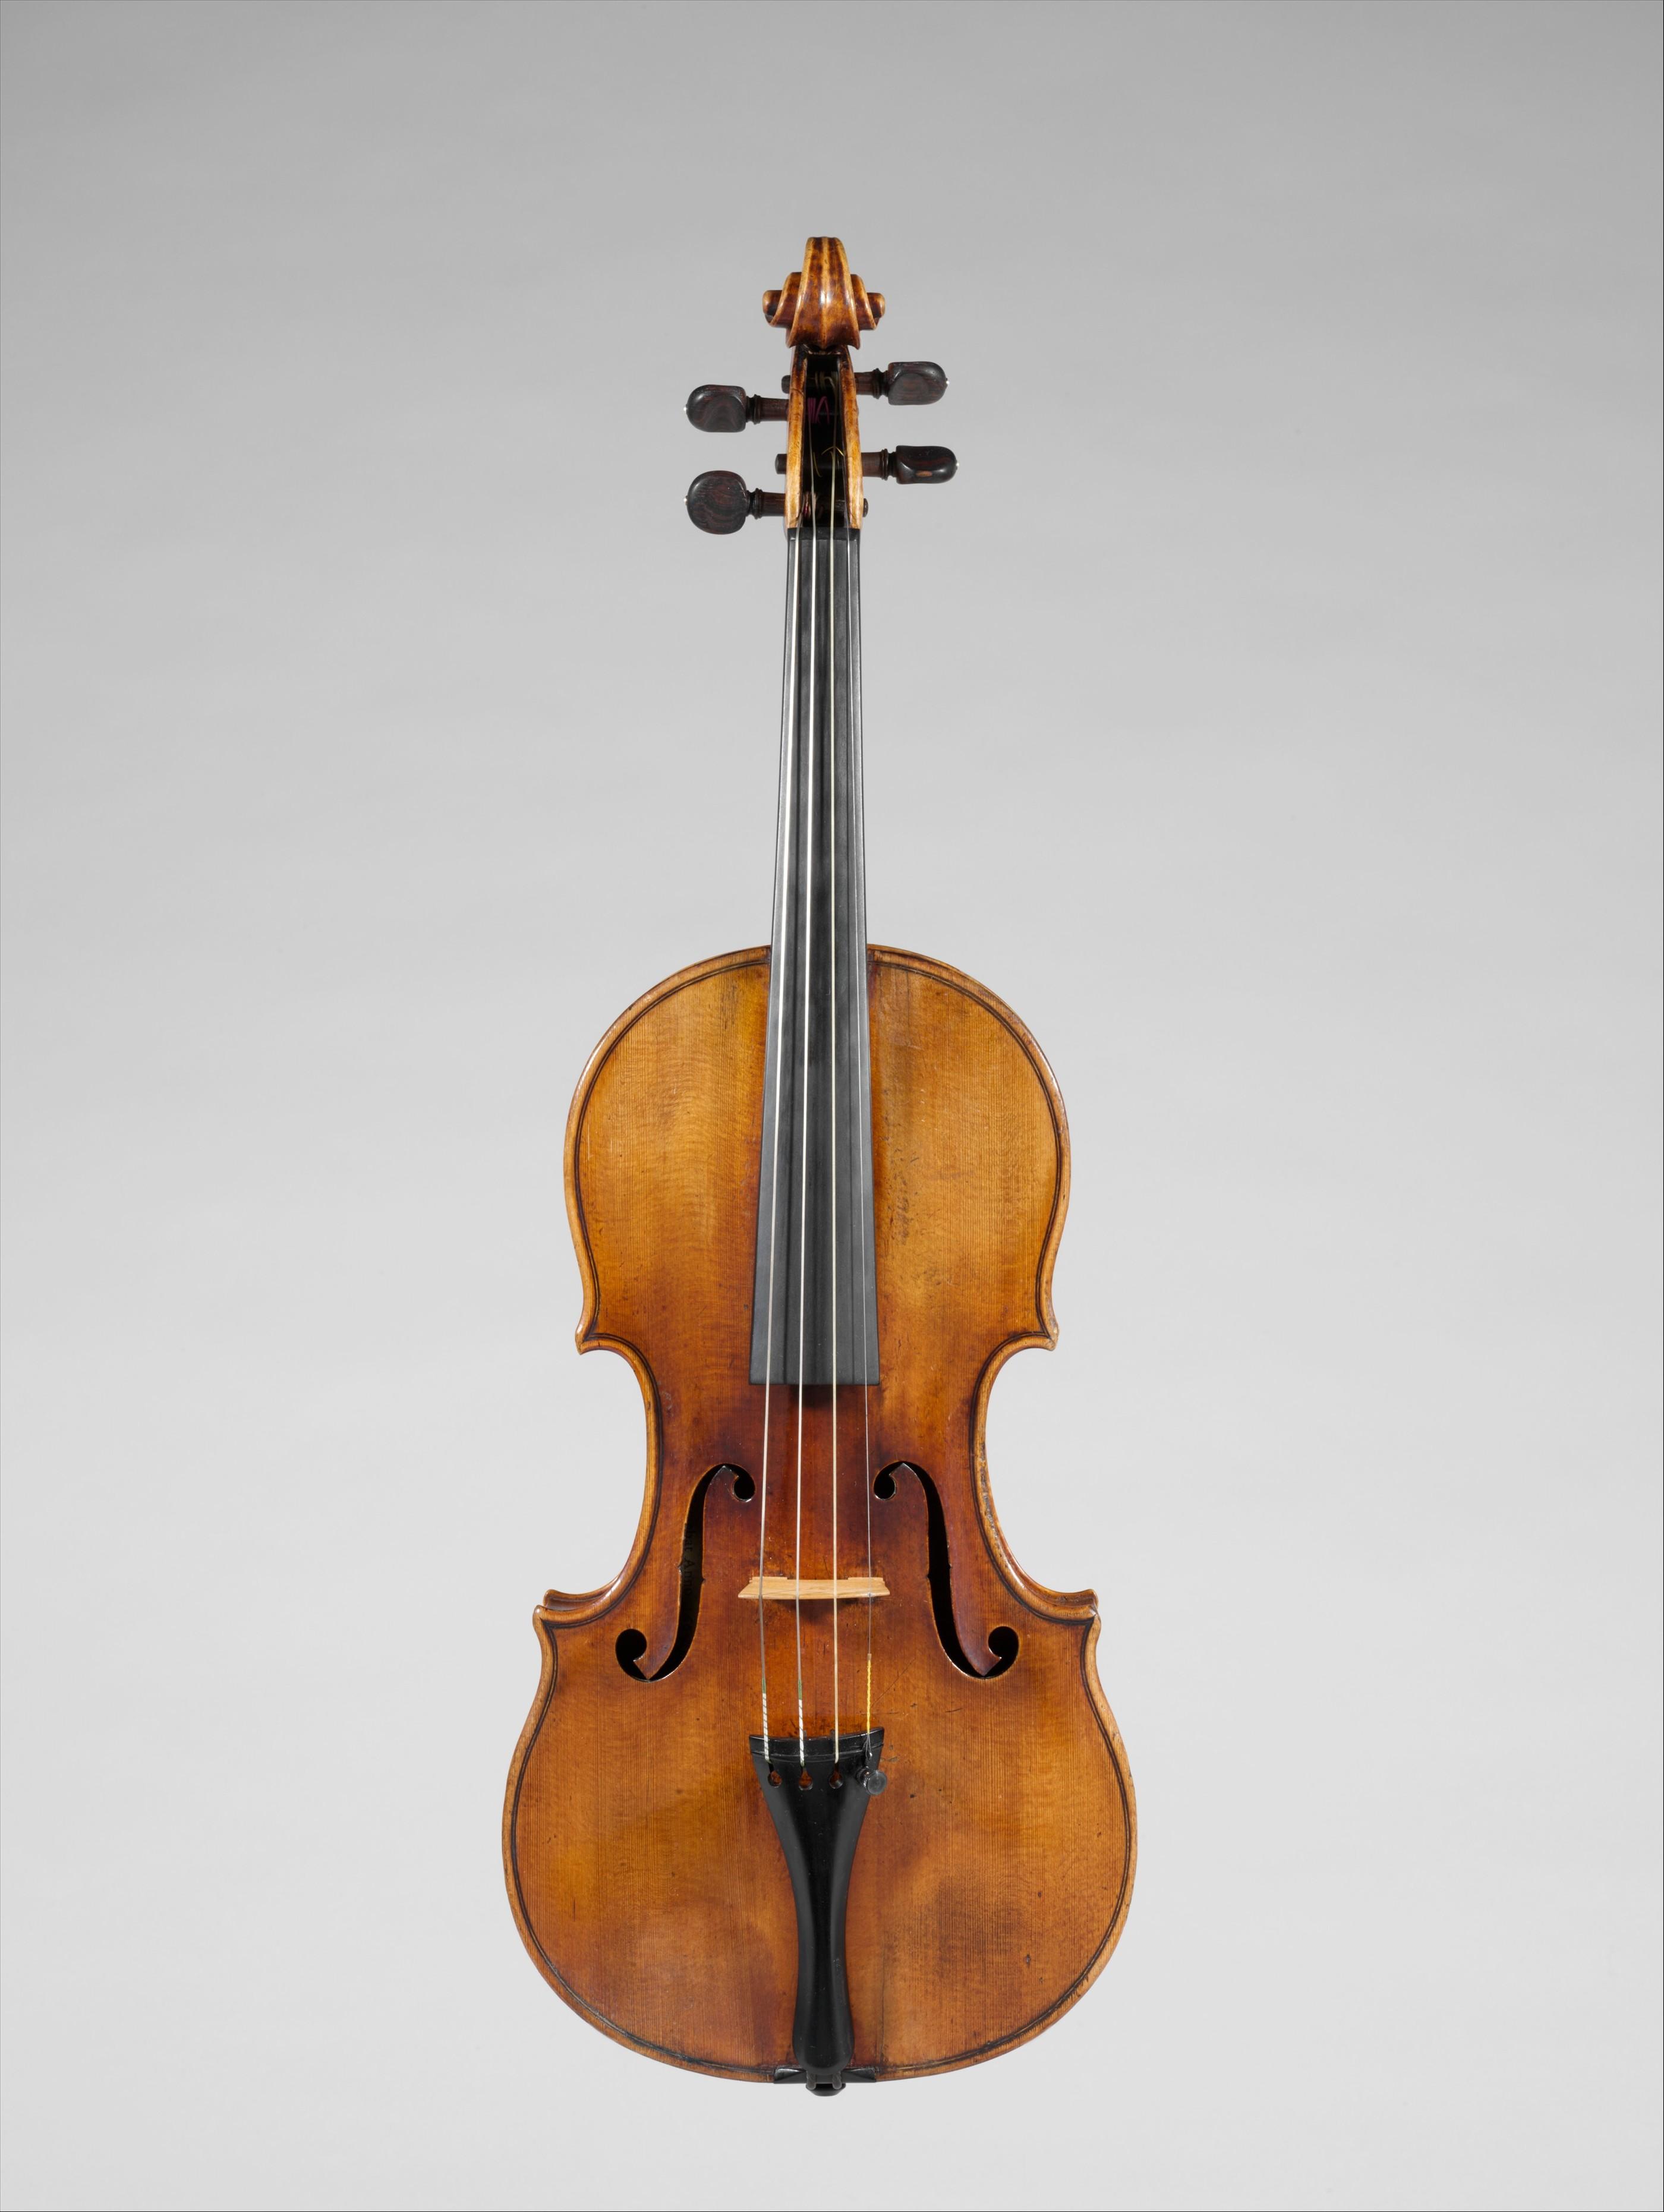 List of Stradivarius instruments - Wikipedia